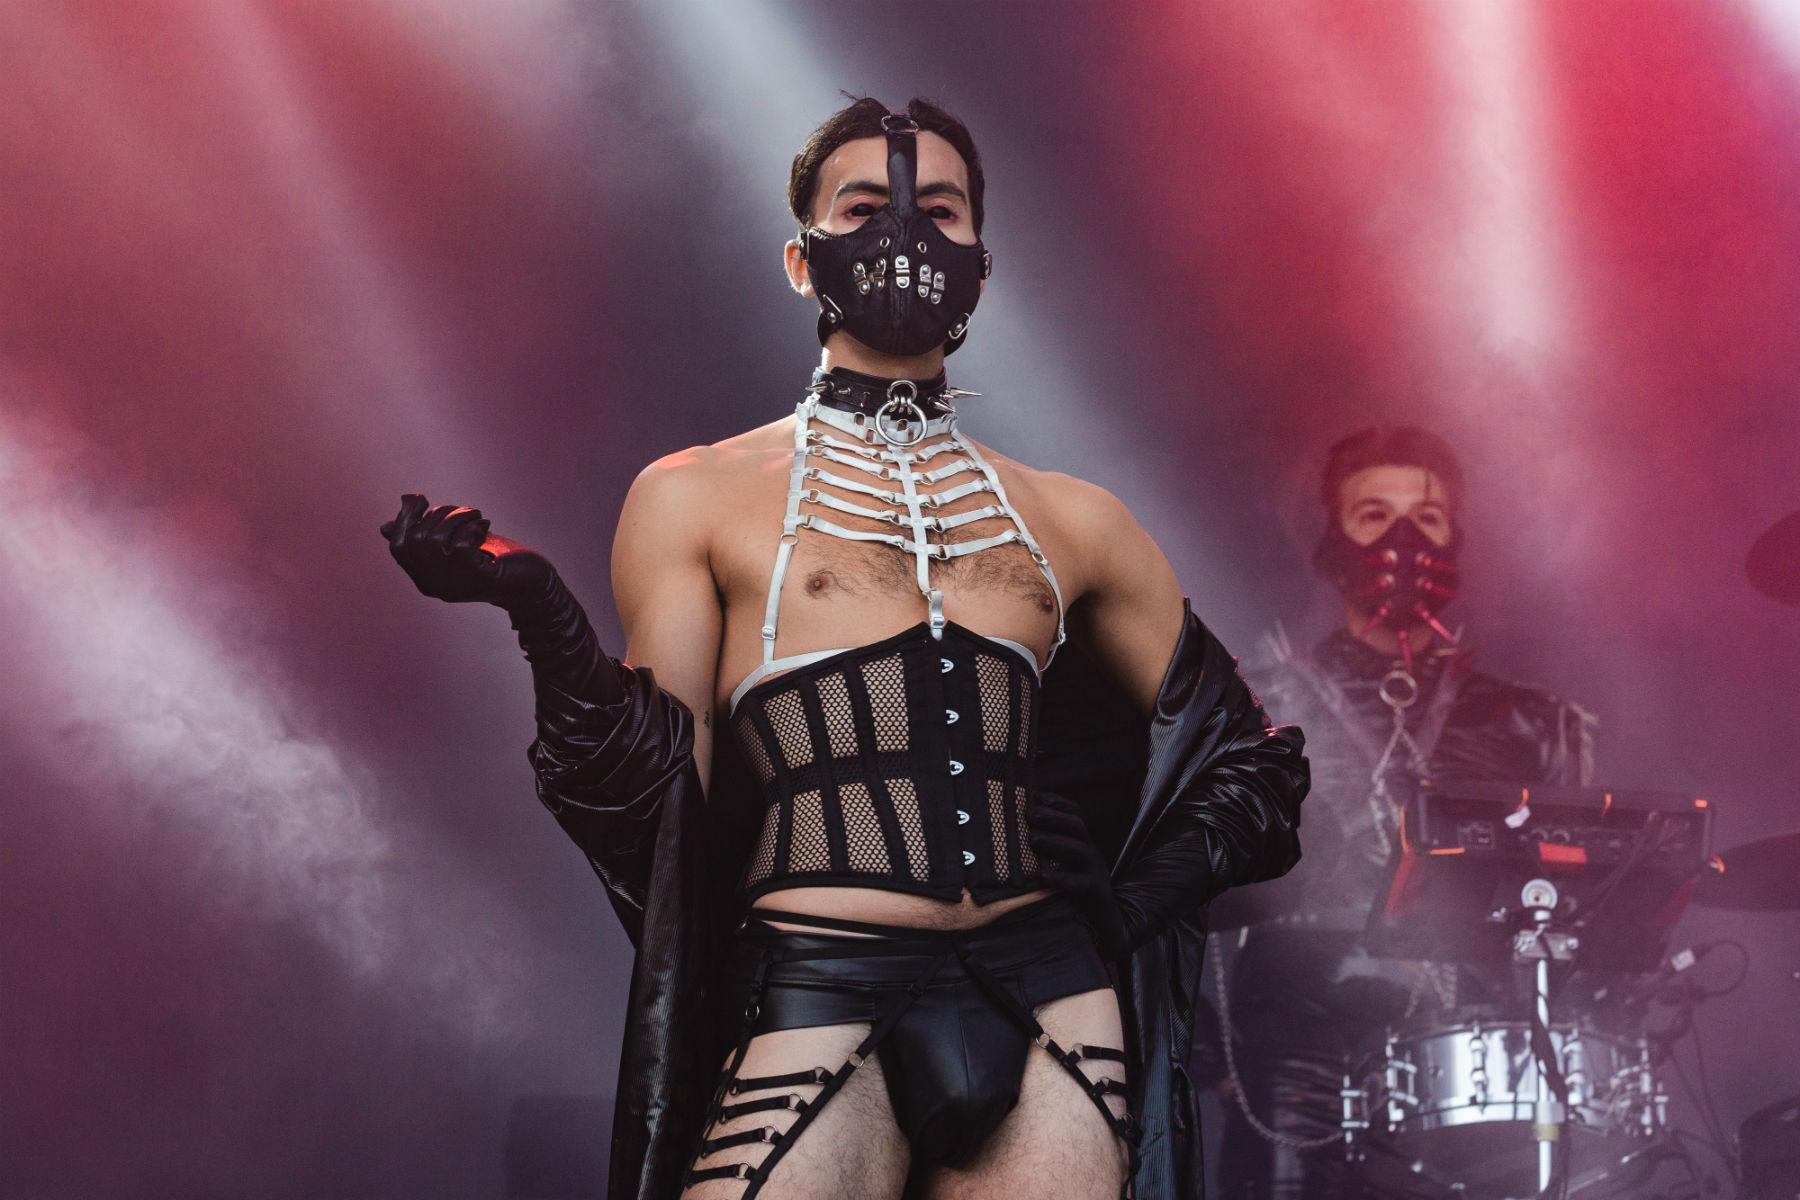 Hatari: BDSM, anty-establishment i10 miejsce naEurowizji